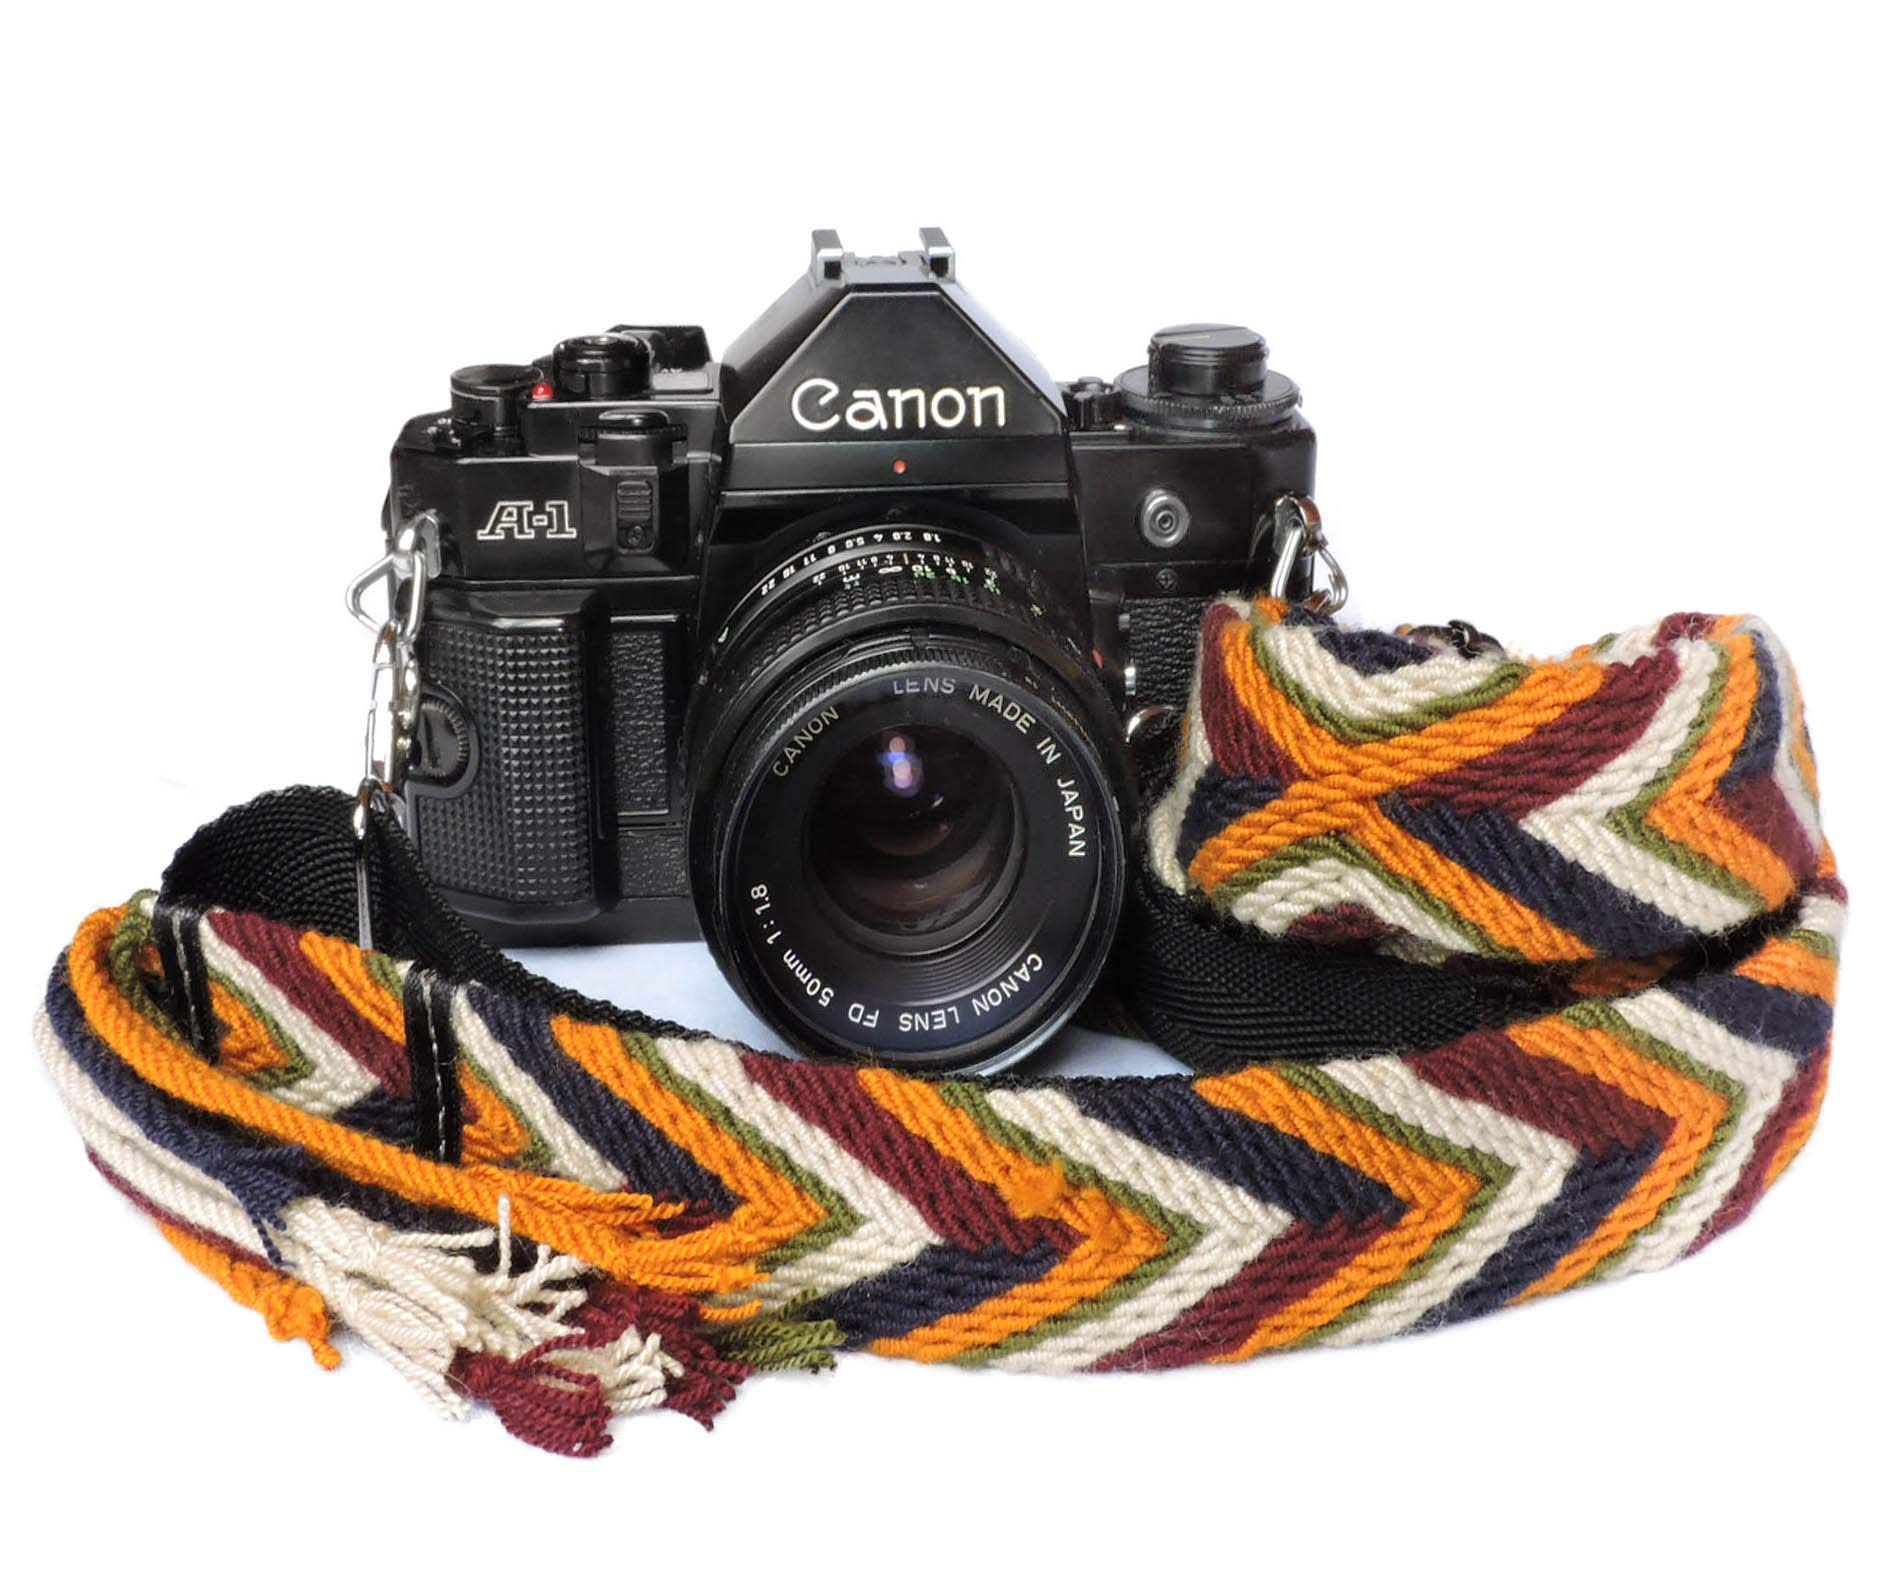 HUIFANGBU JHY Retro Ethnic Style Multi-Color Series Shoulder Neck Strap Camera Strap for SLR//DSLR Cameras Color : Color3